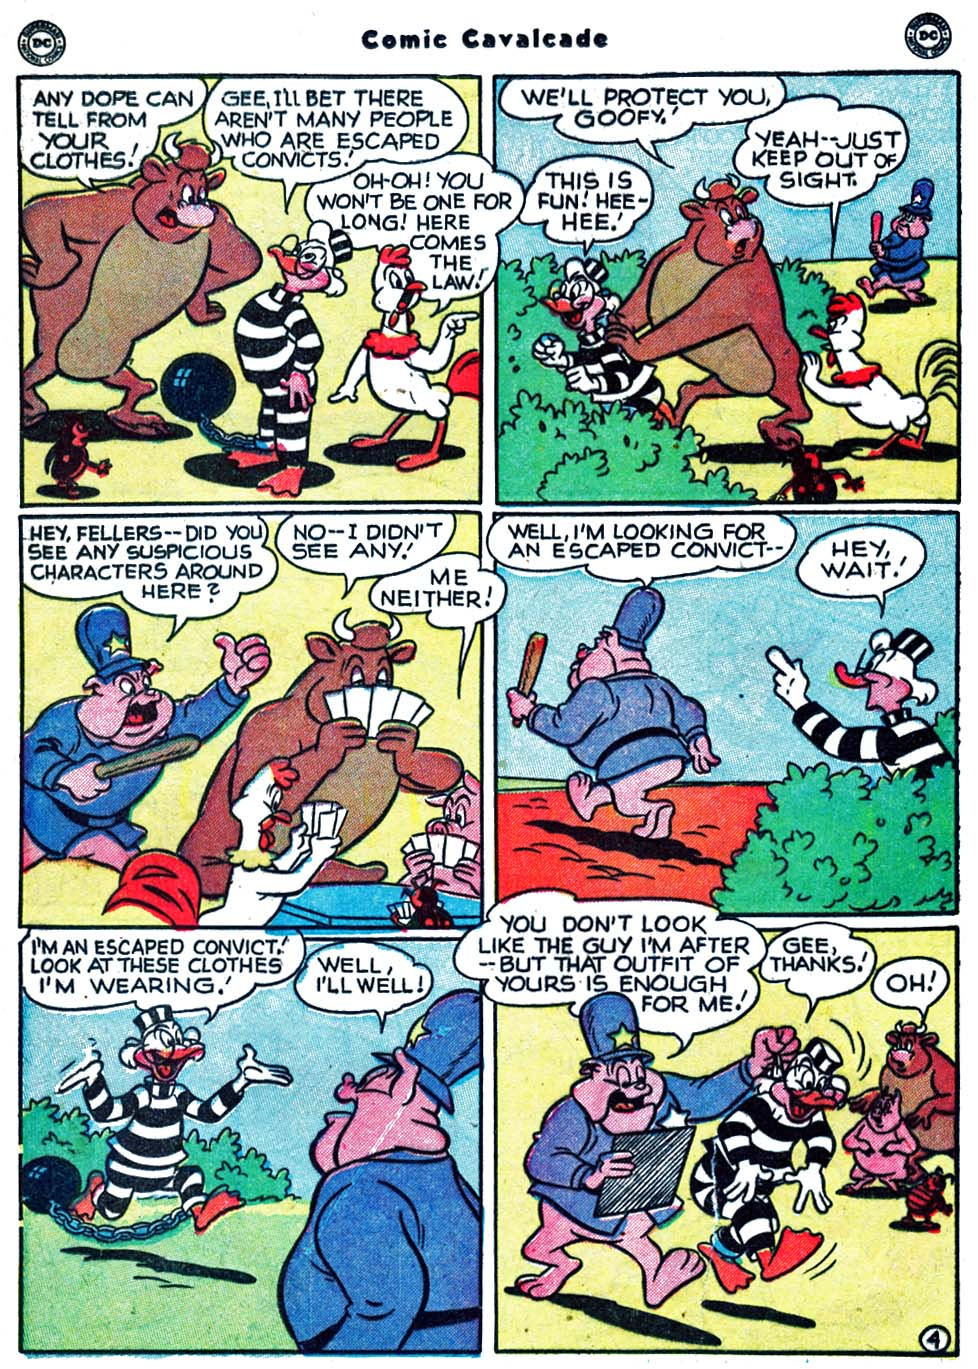 Comic Cavalcade issue 40 - Page 64